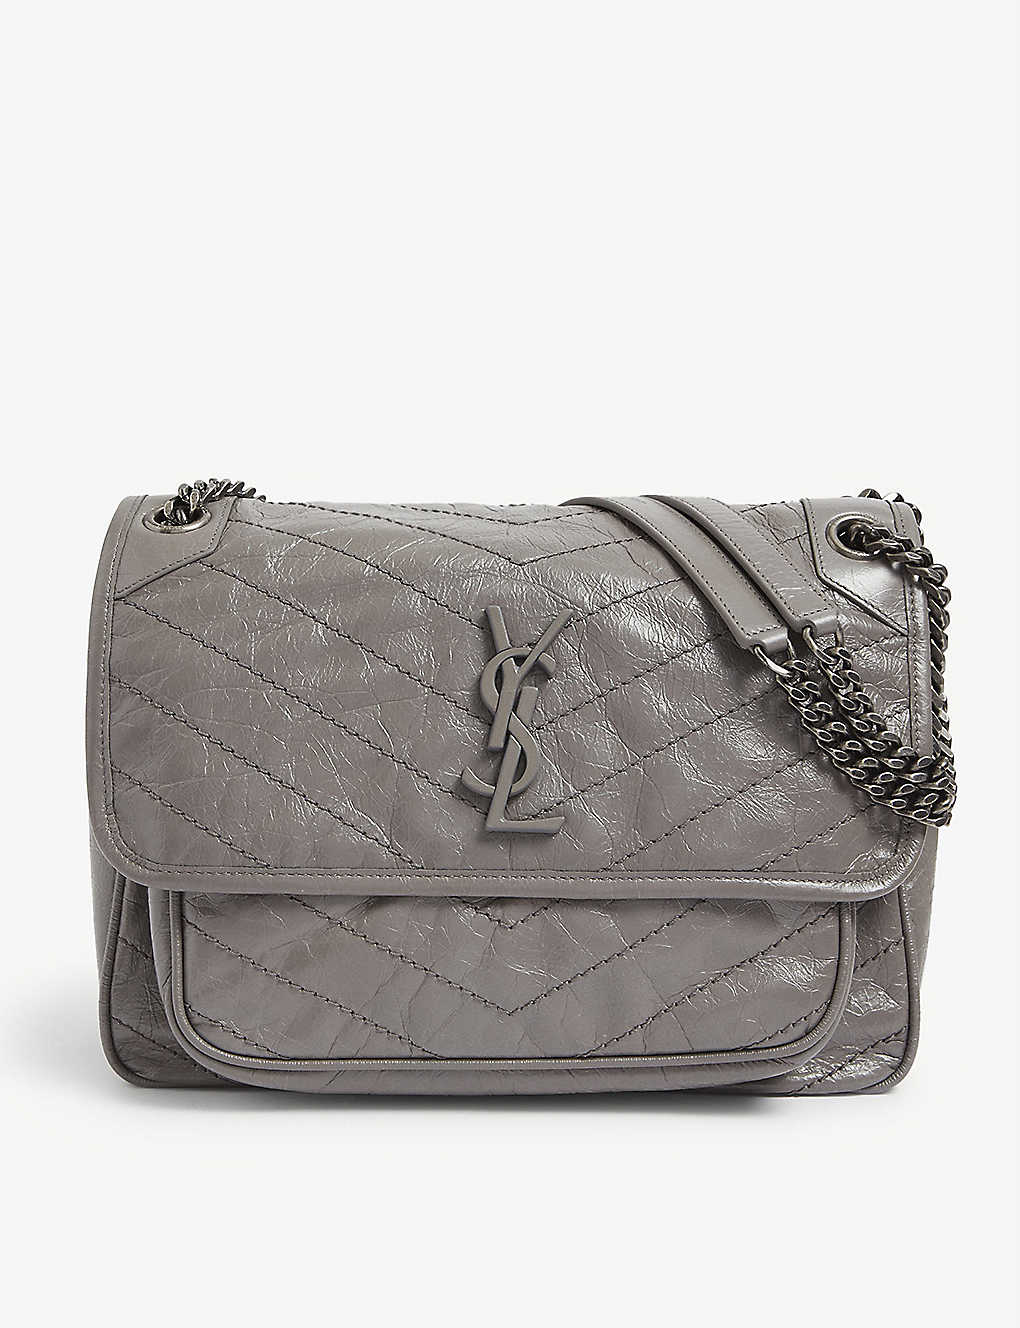 SAINT LAURENT: Niki medium leather shoulder bag